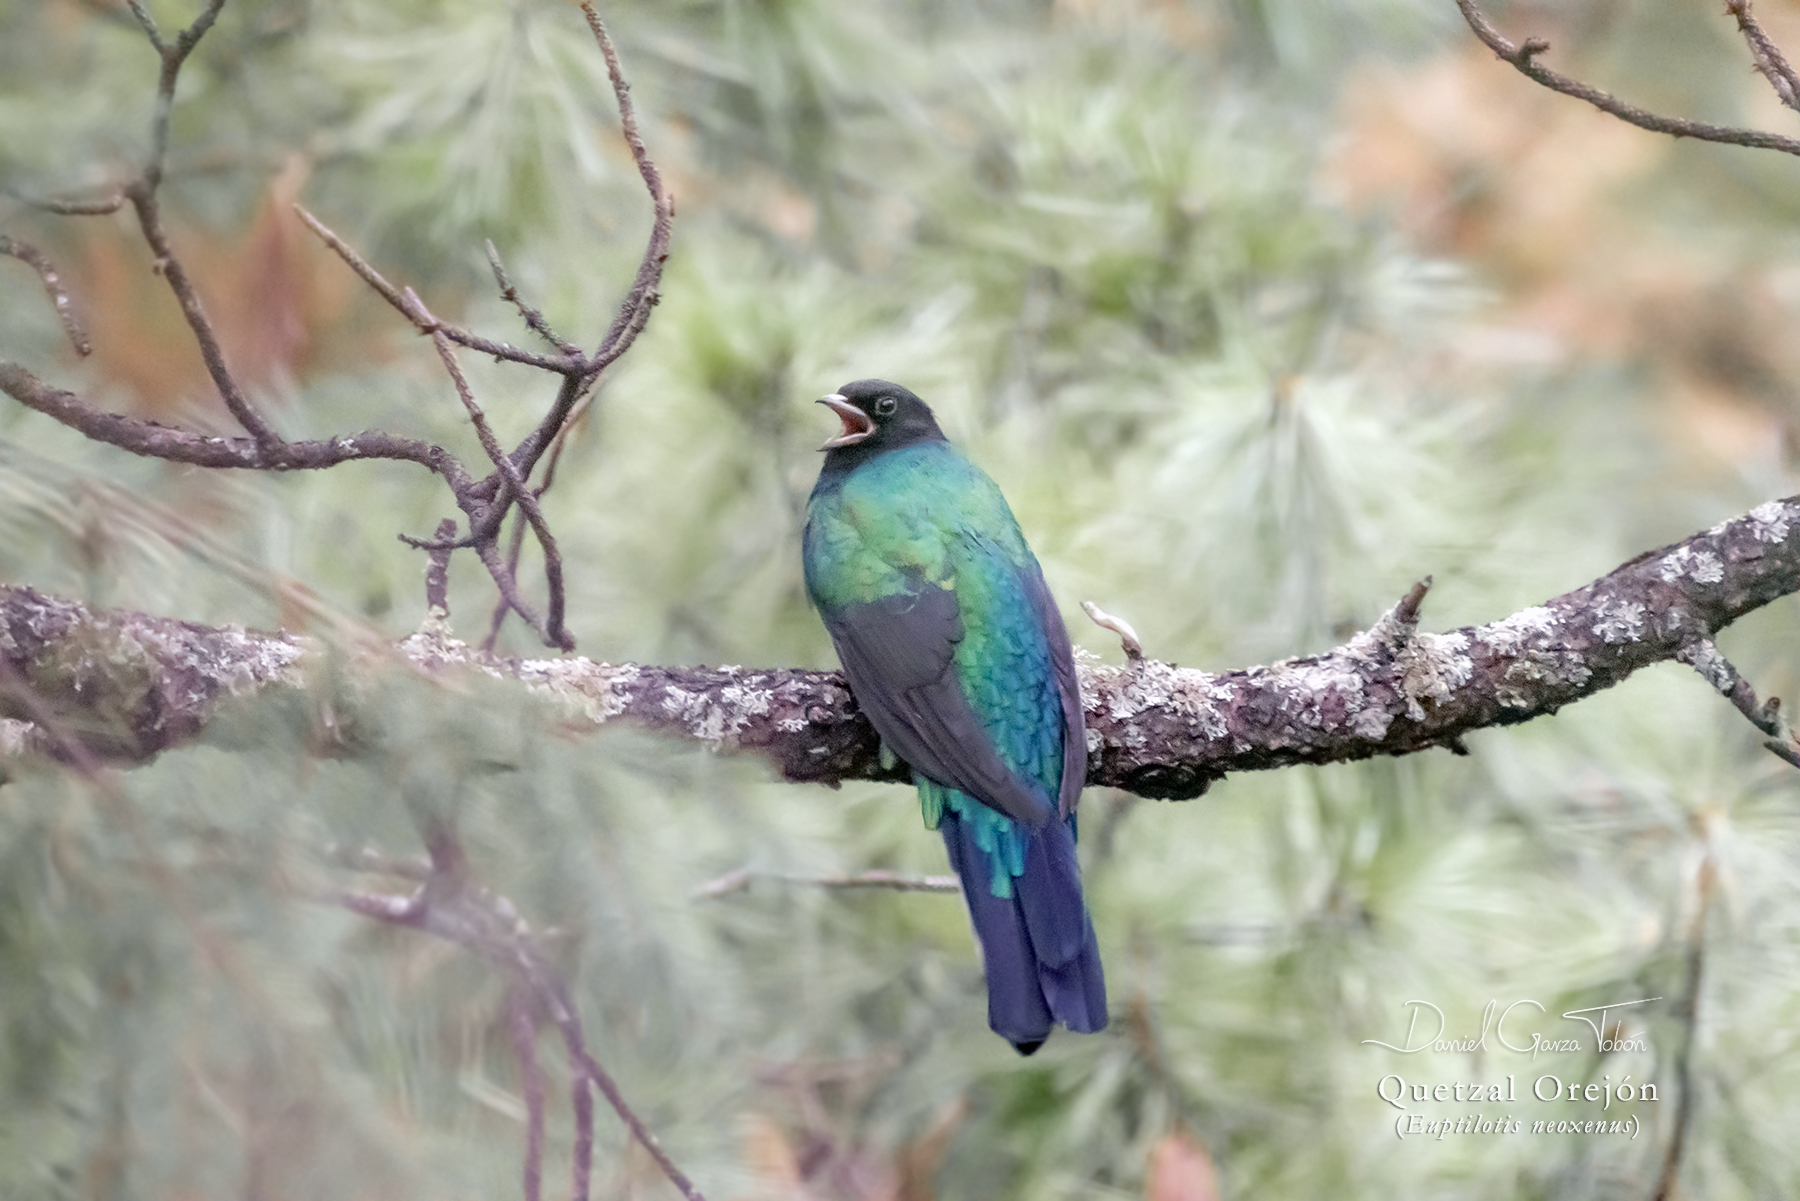 Quetzal Orejón. Foto: Daniel Garza Tobón.